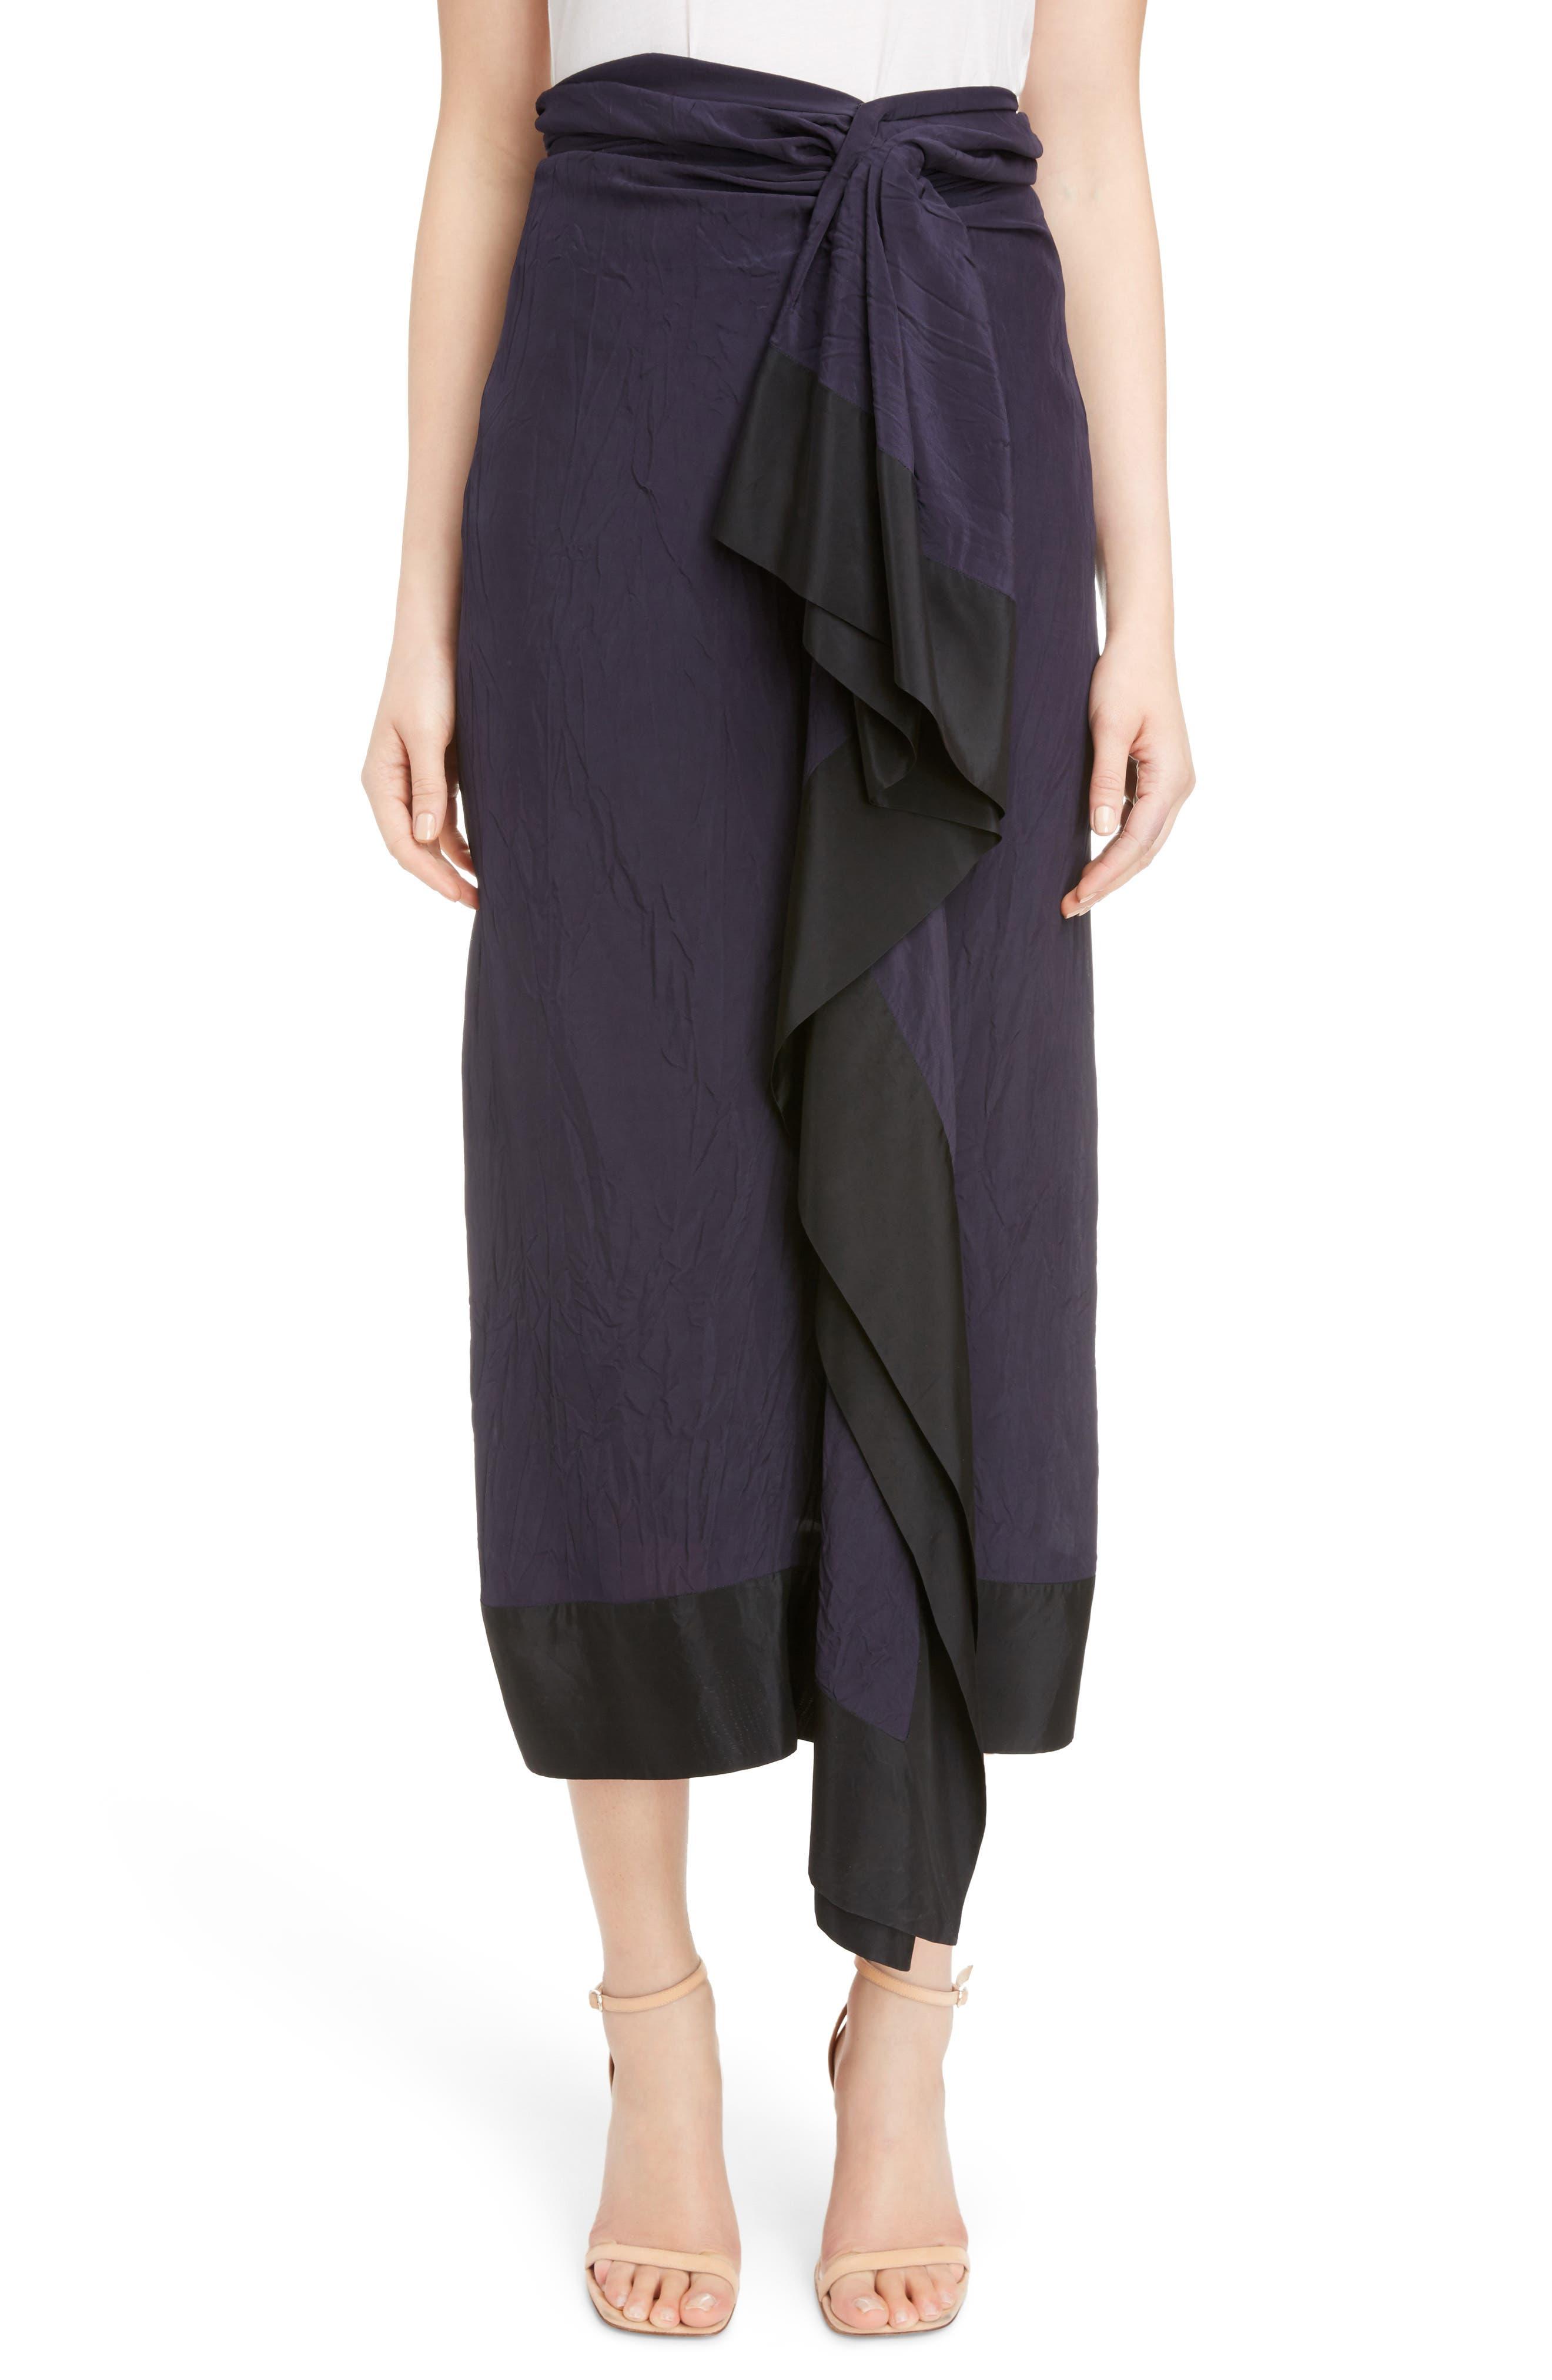 Dries Van Noten Pareo Tie Front Midi Skirt